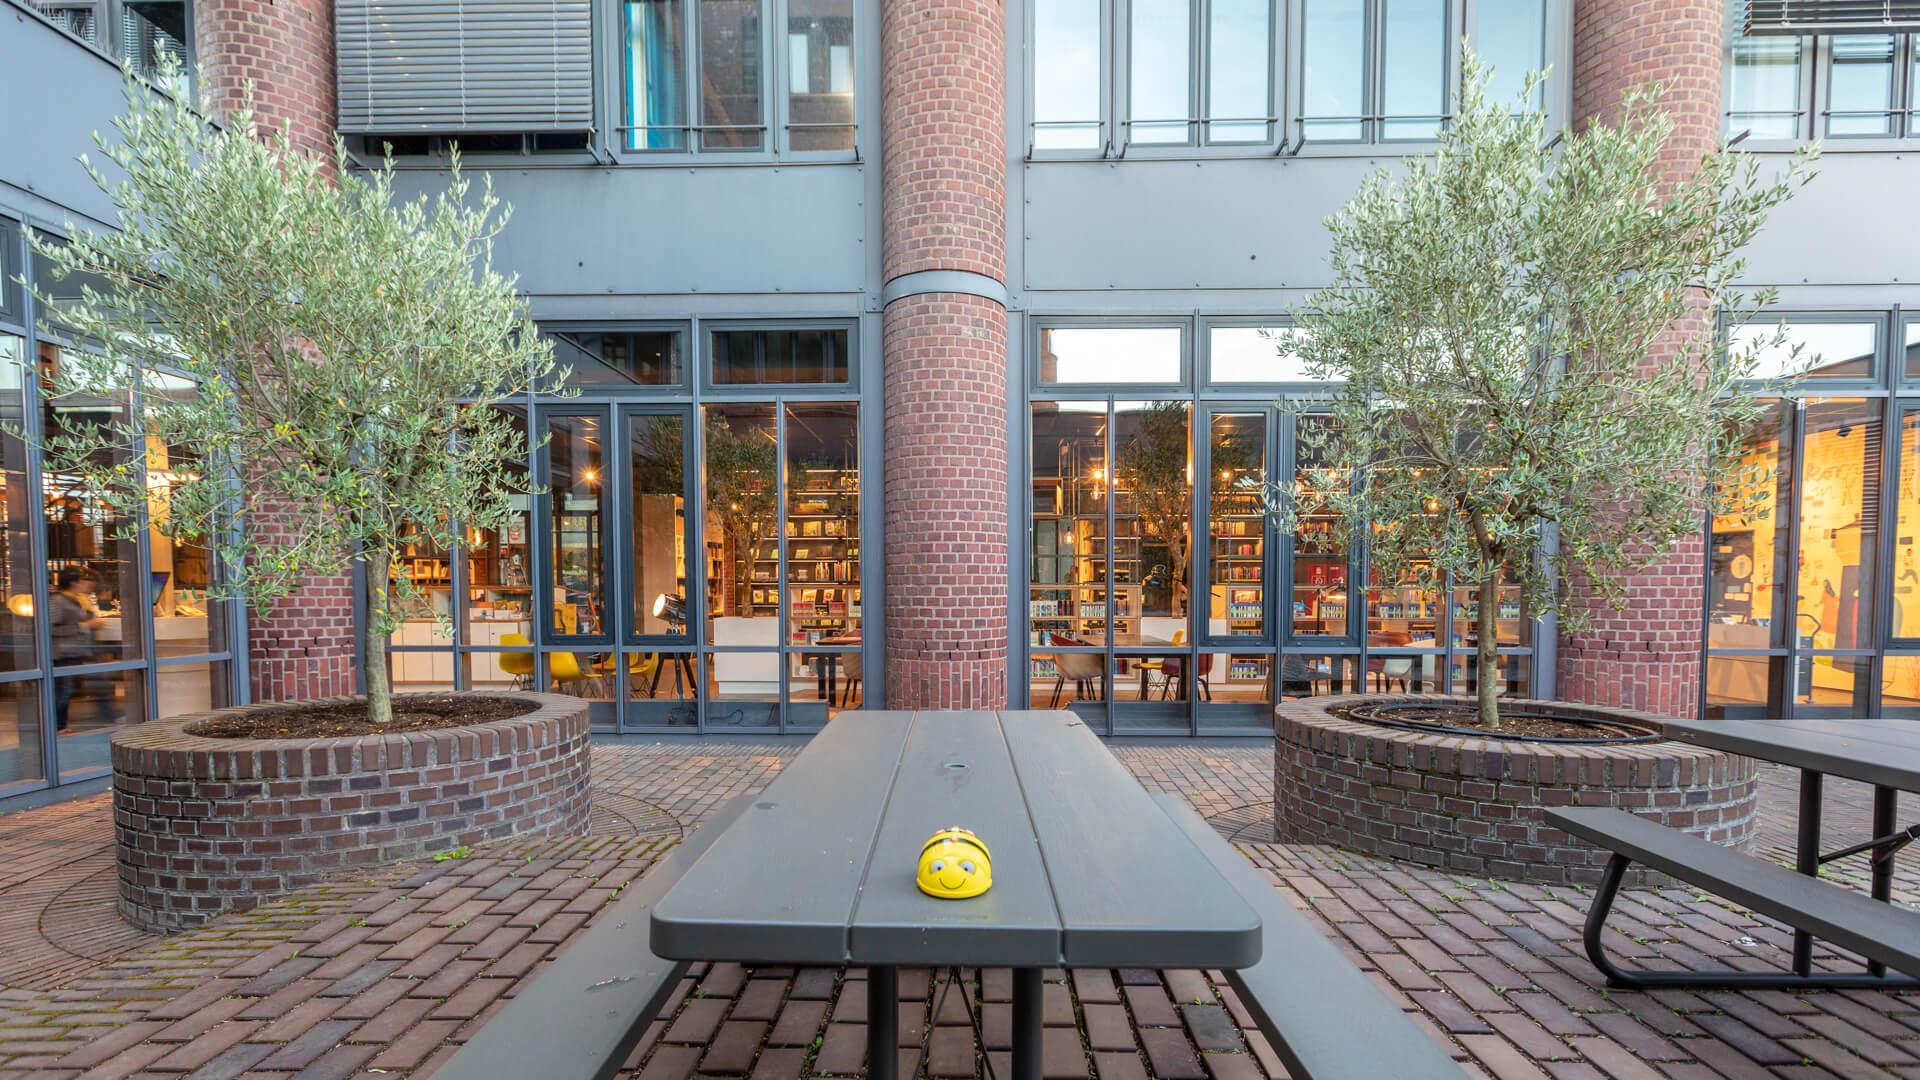 Aatvos_Koln-Kalk_library-social-inclusion-14